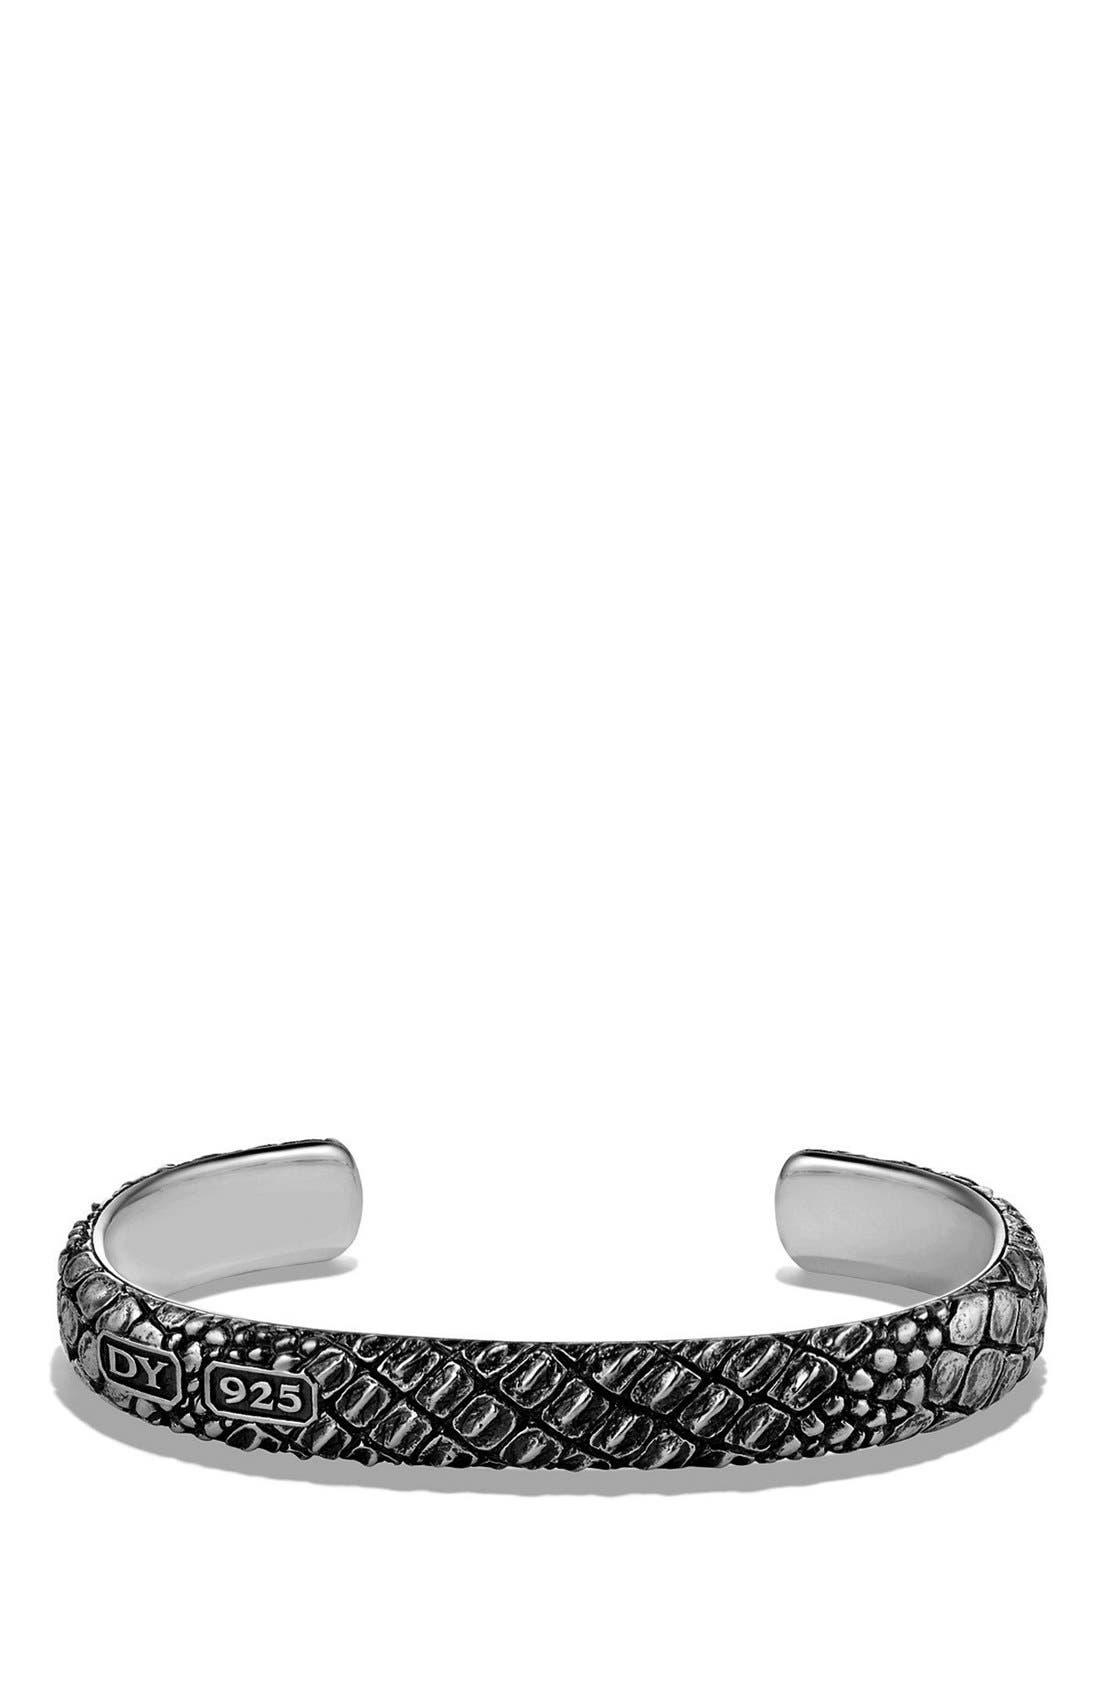 DAVID YURMAN Naturals Gator Cuff Bracelet